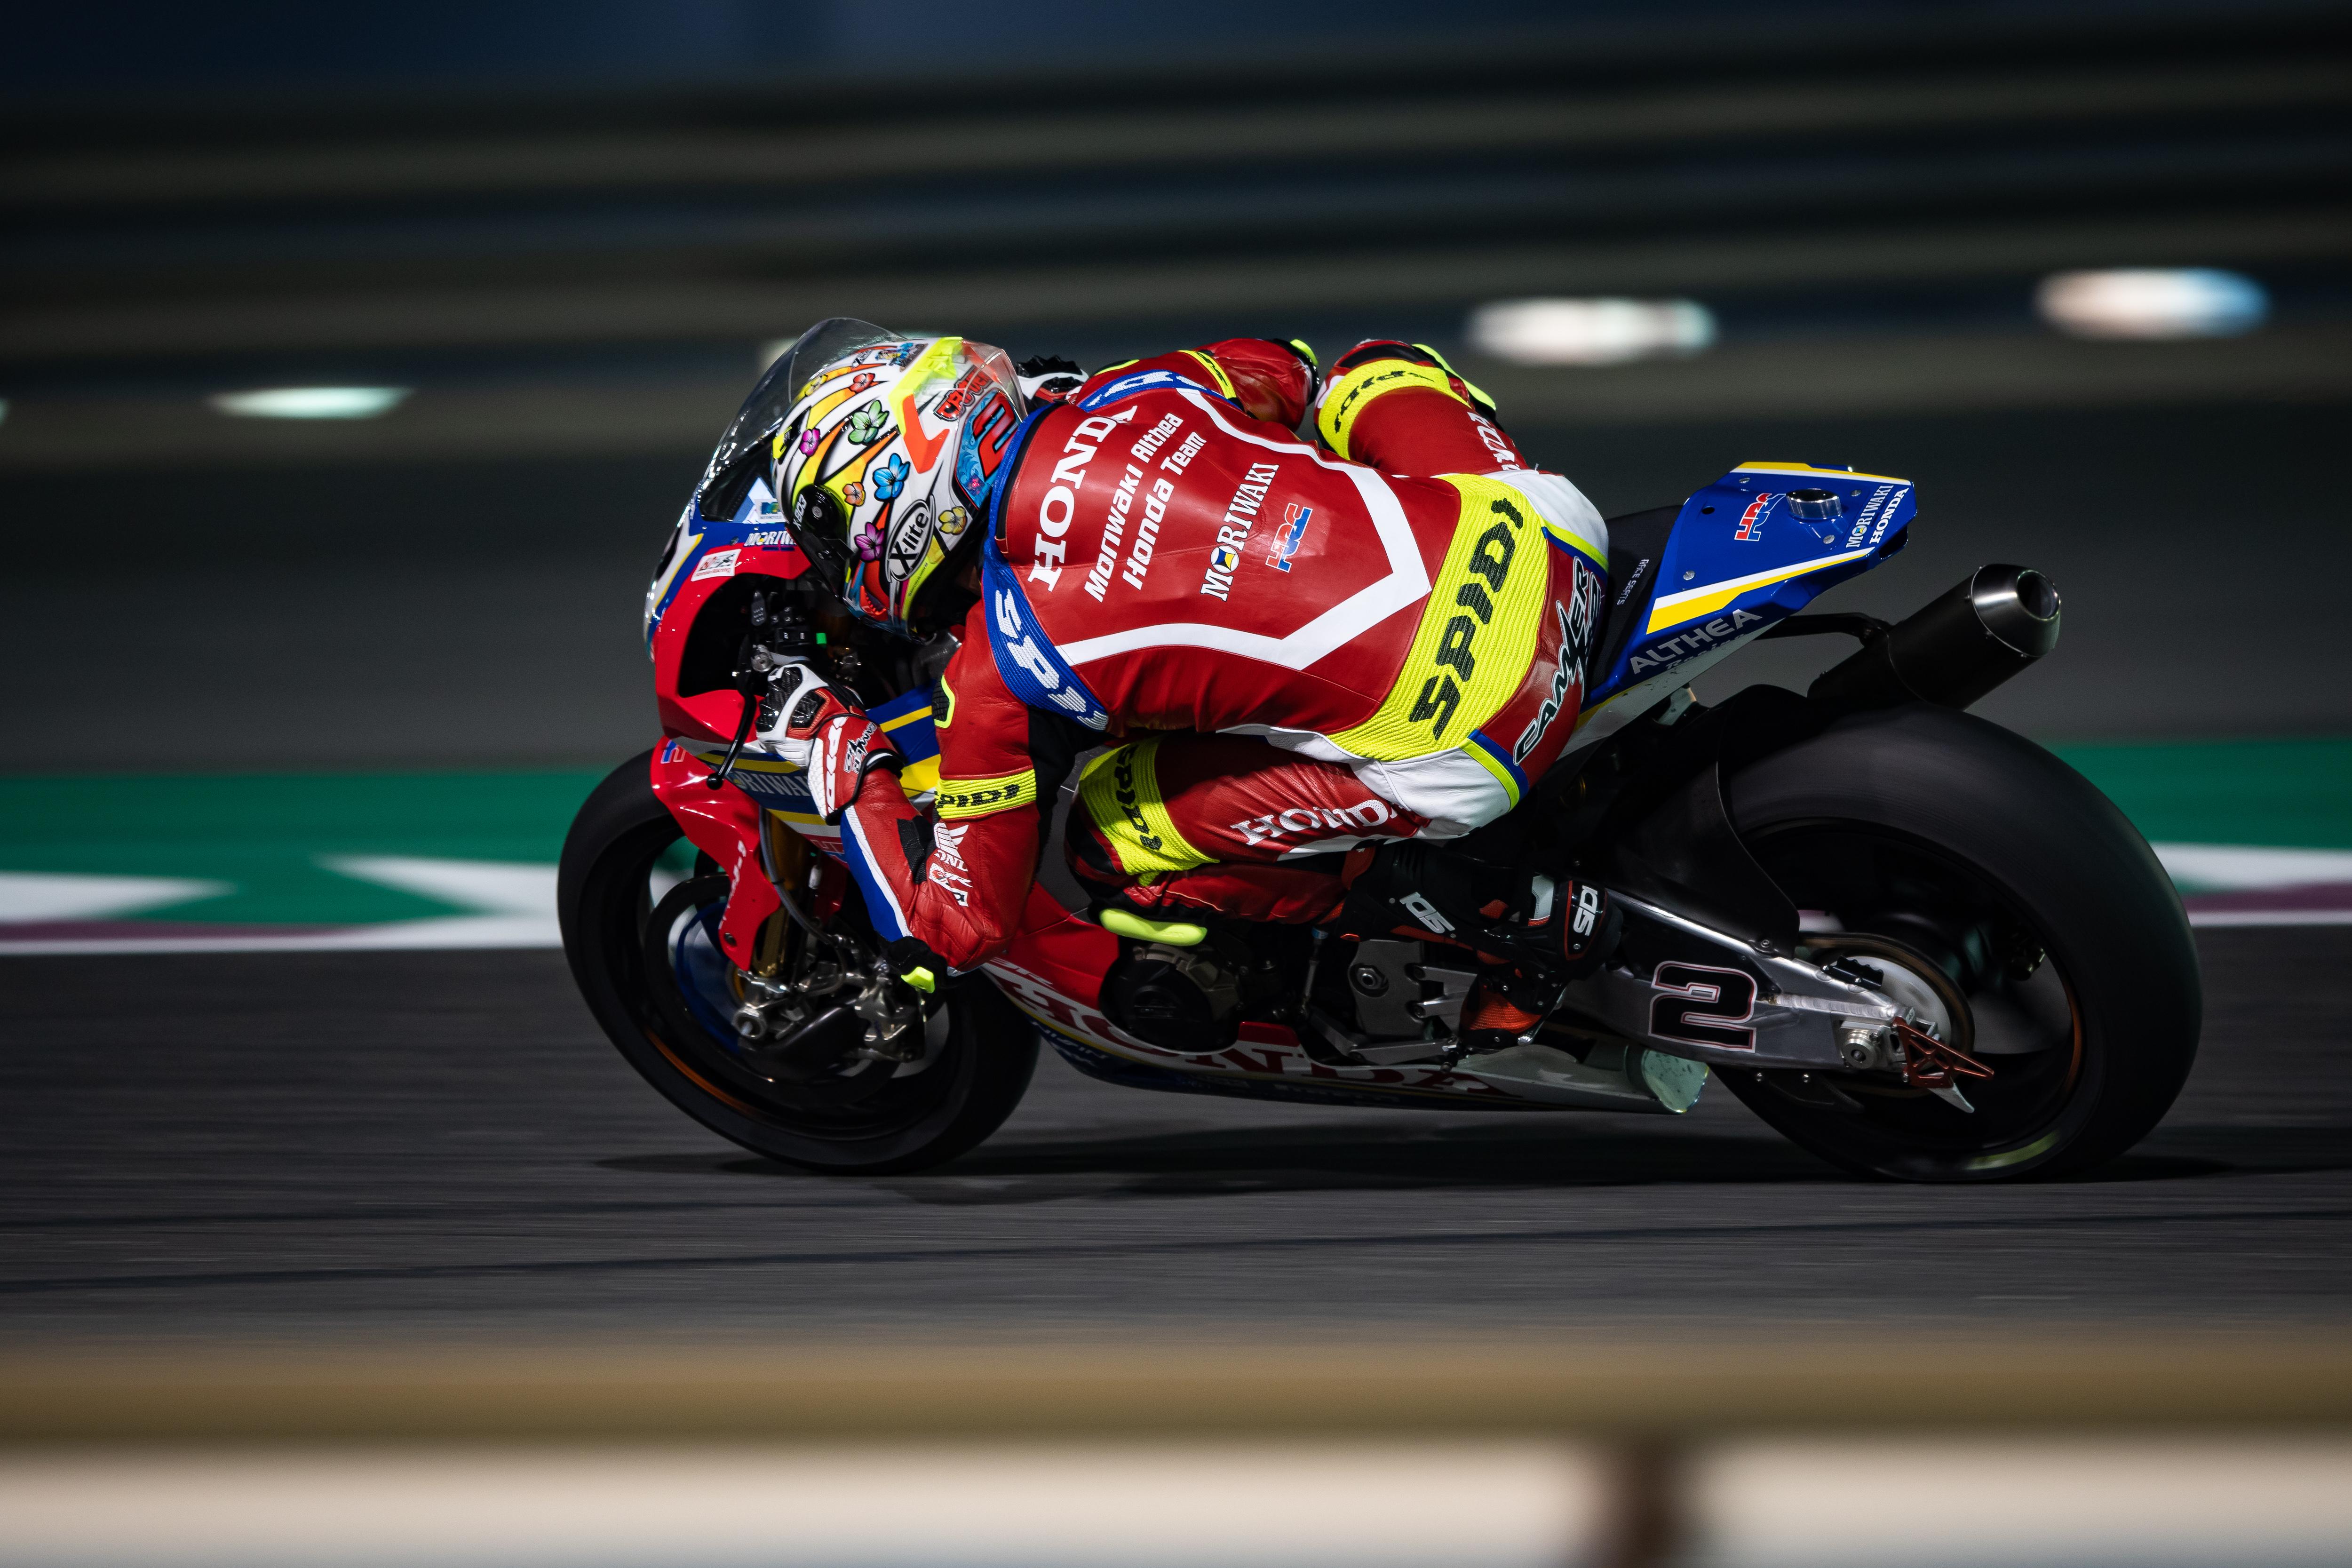 Moriwaki_Althea_Honda_Team_Qatar_29